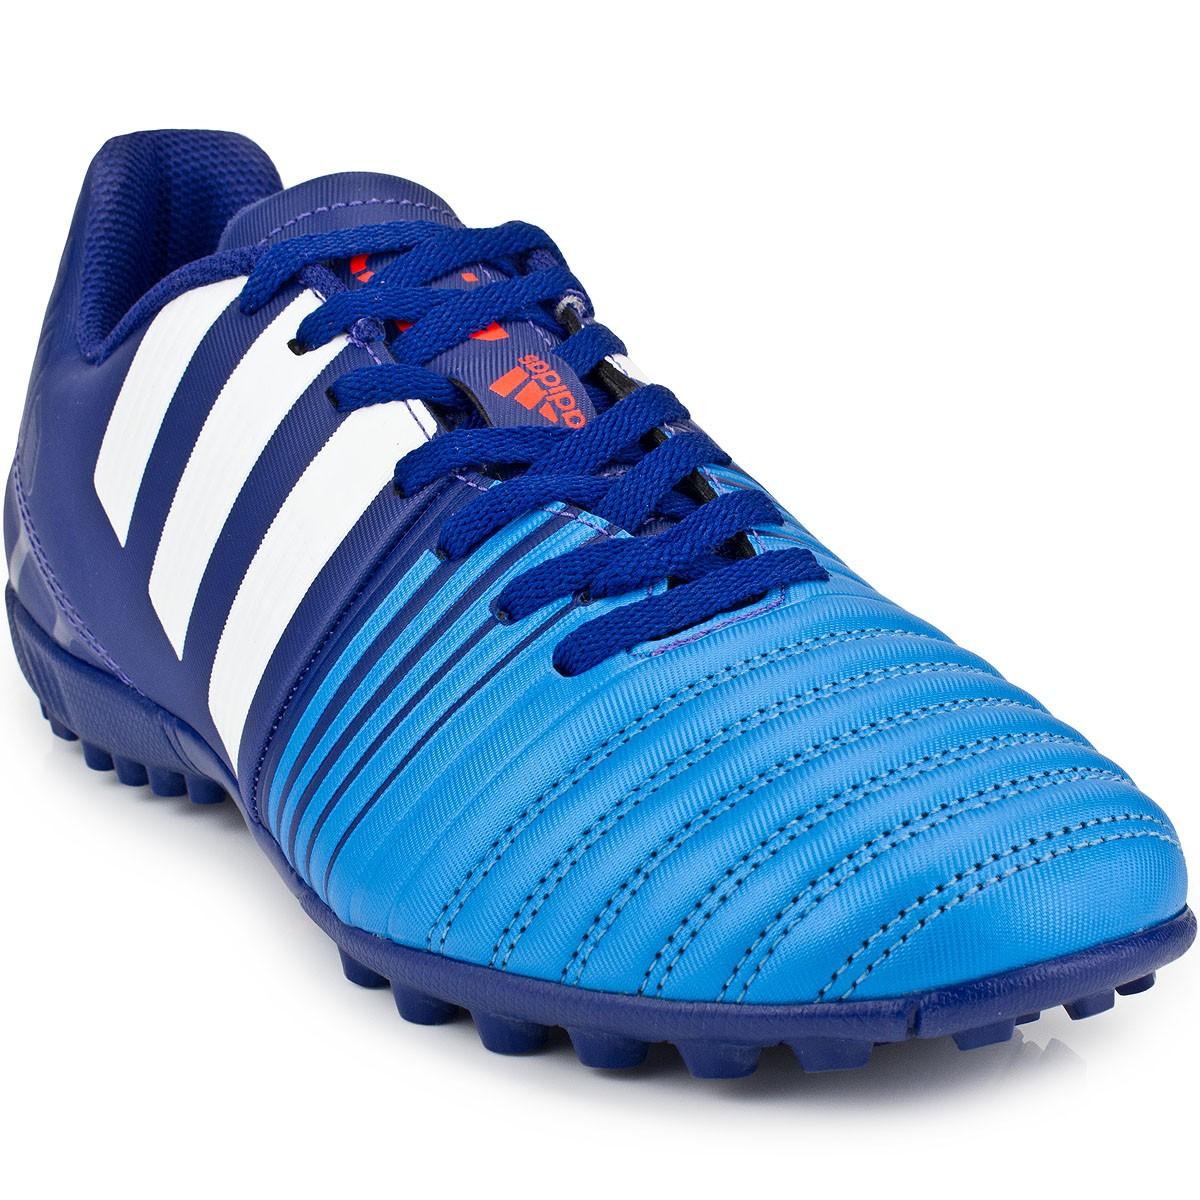 Chuteira Adidas Nitrocharge 4.0 TF  e0257f6bb00e6